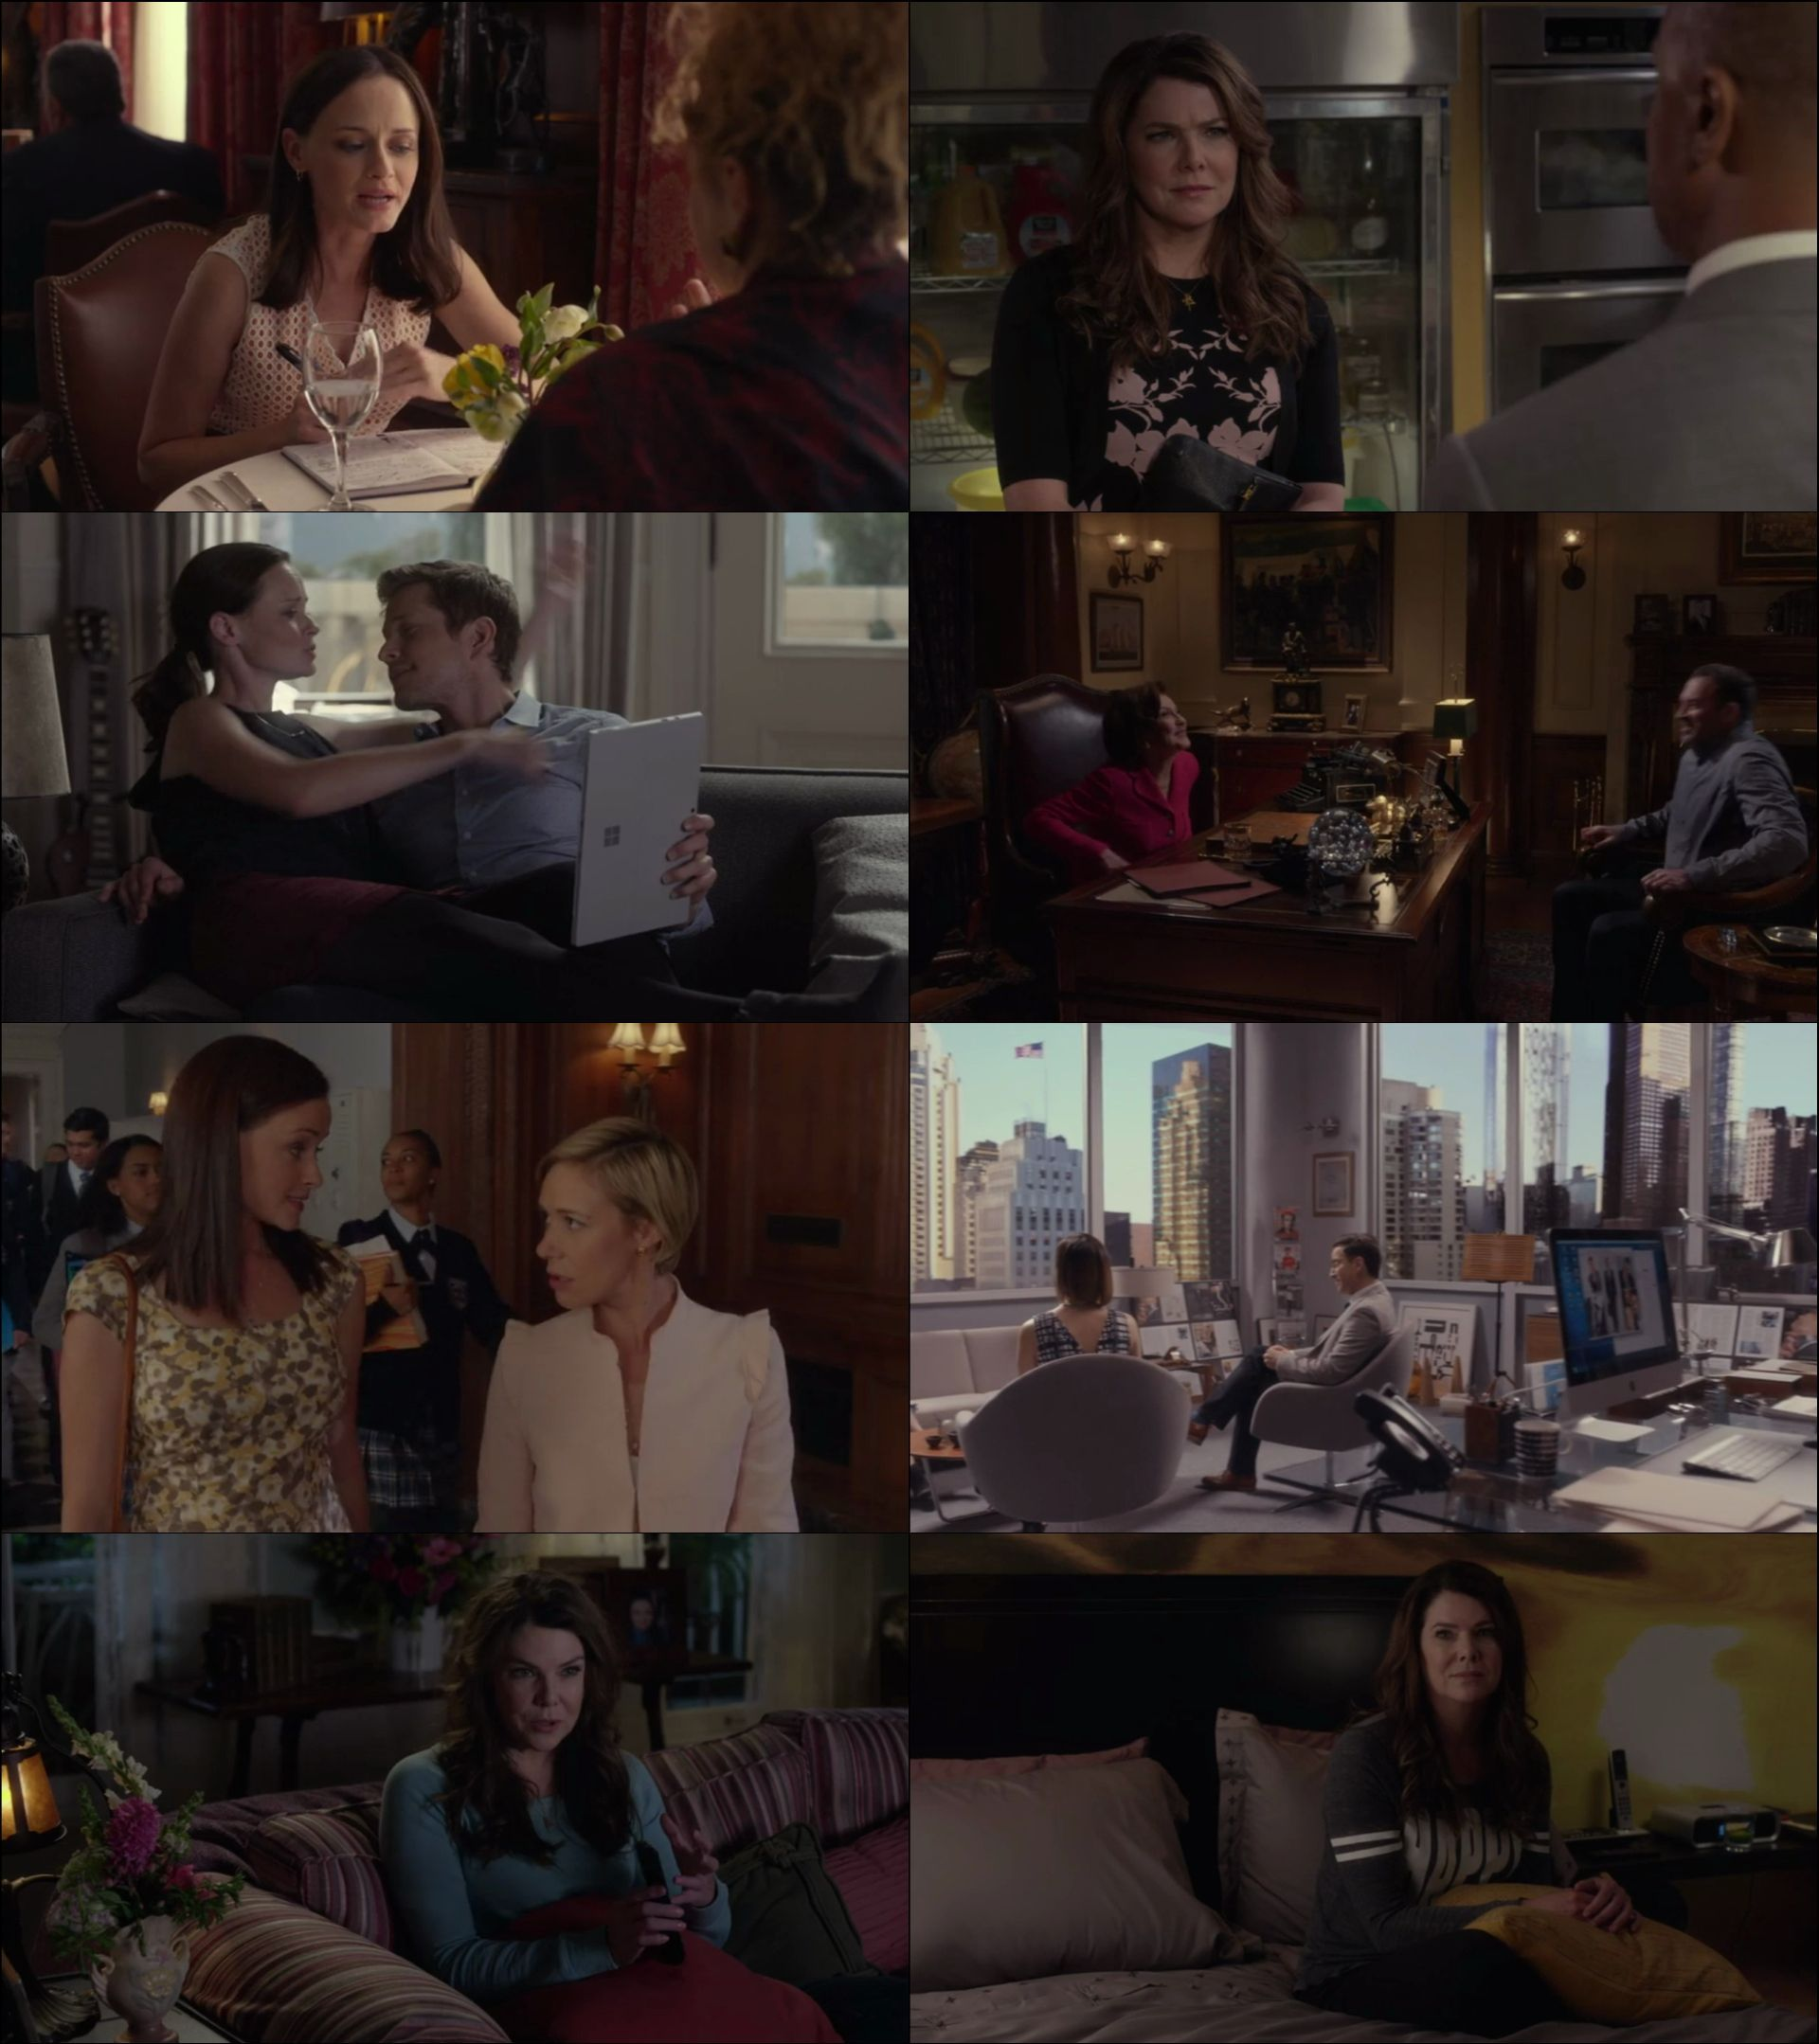 Gilmore Girls: A Year in the Life Mini Dizi (2016) türkçe dublaj dizi indir